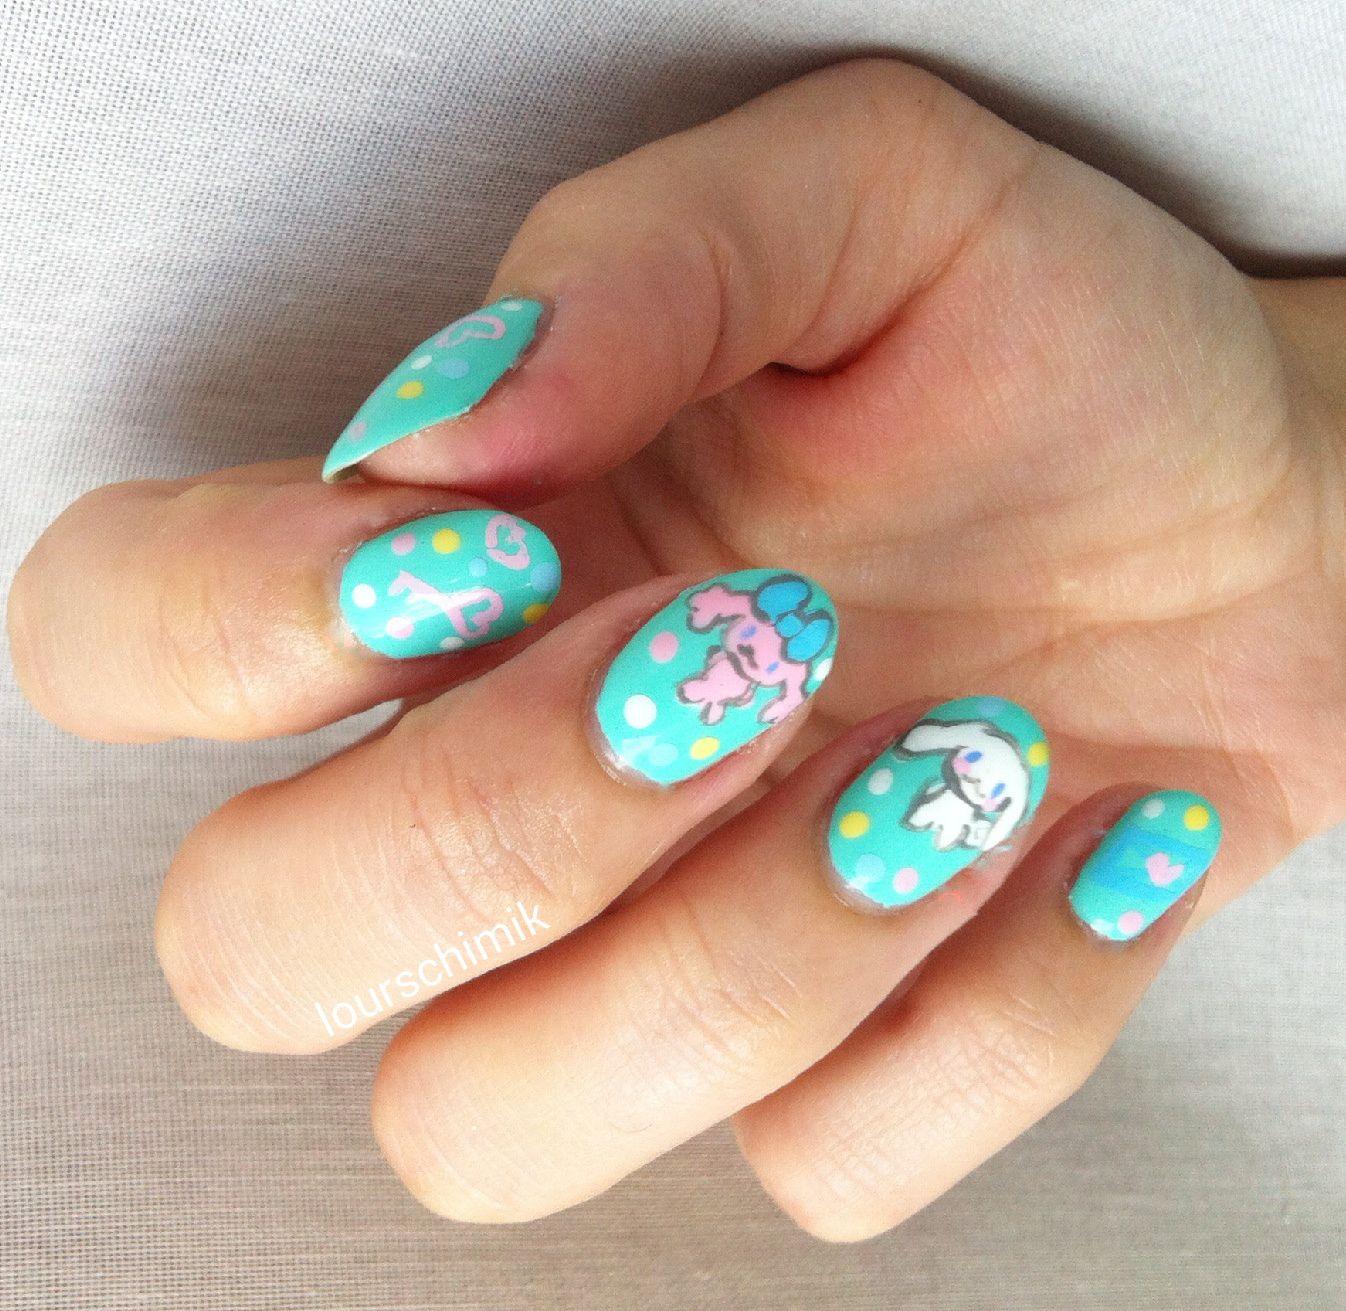 nailstorming assortie à sa déco - cinnamoroll nail art